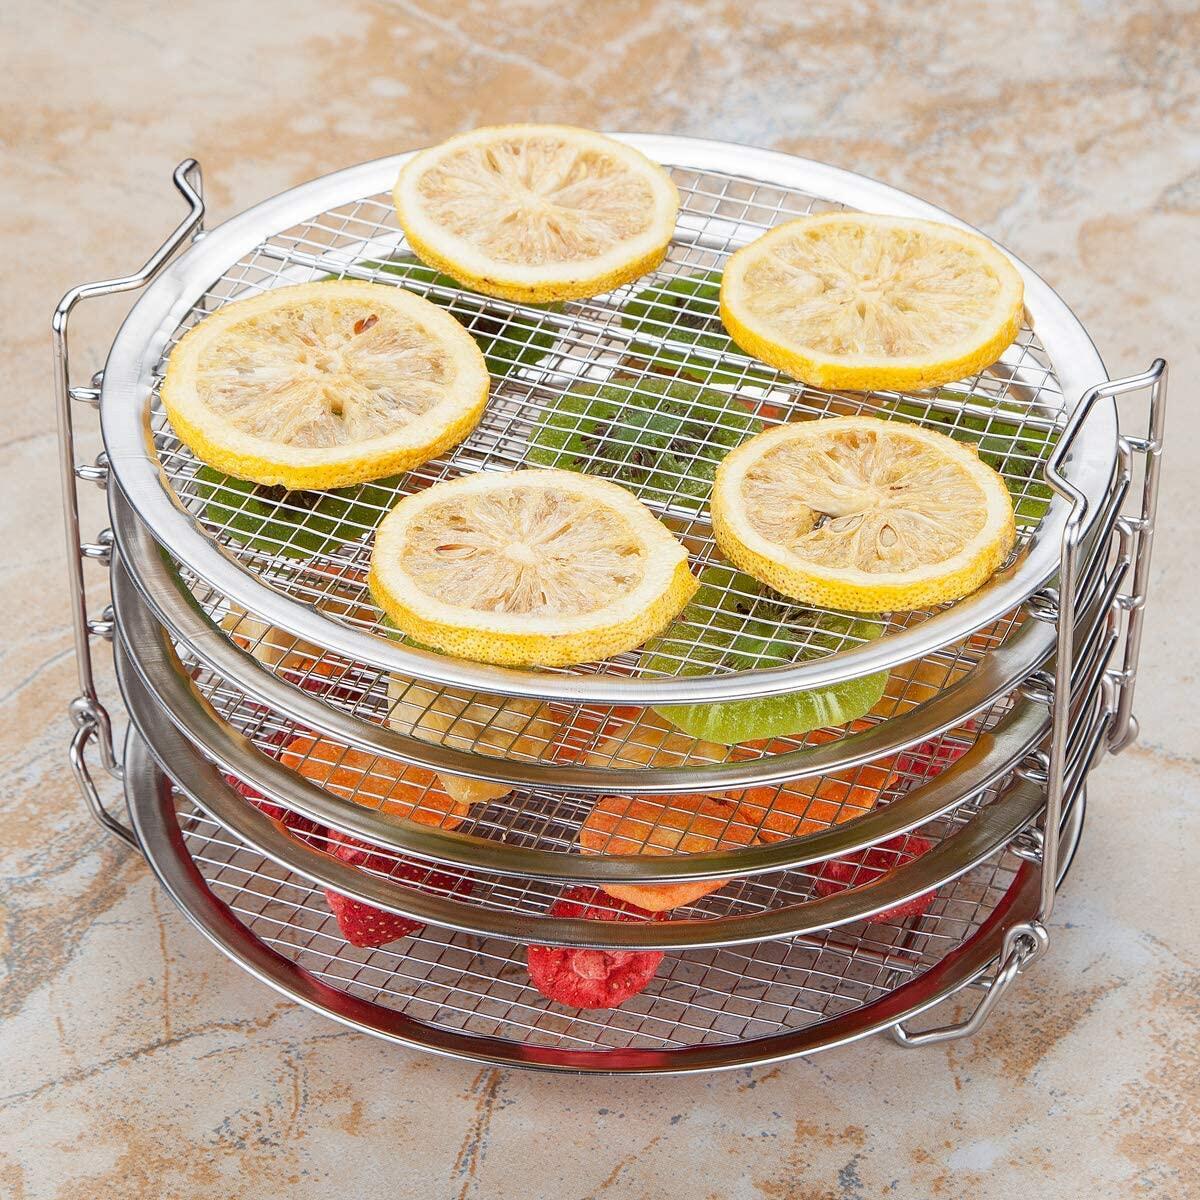 Dehydrator Rack For Ninja Foodi 6.5 & 8 qt, Instant Pot Duo Crisp 8 qt. Food Grade Stainless Steel